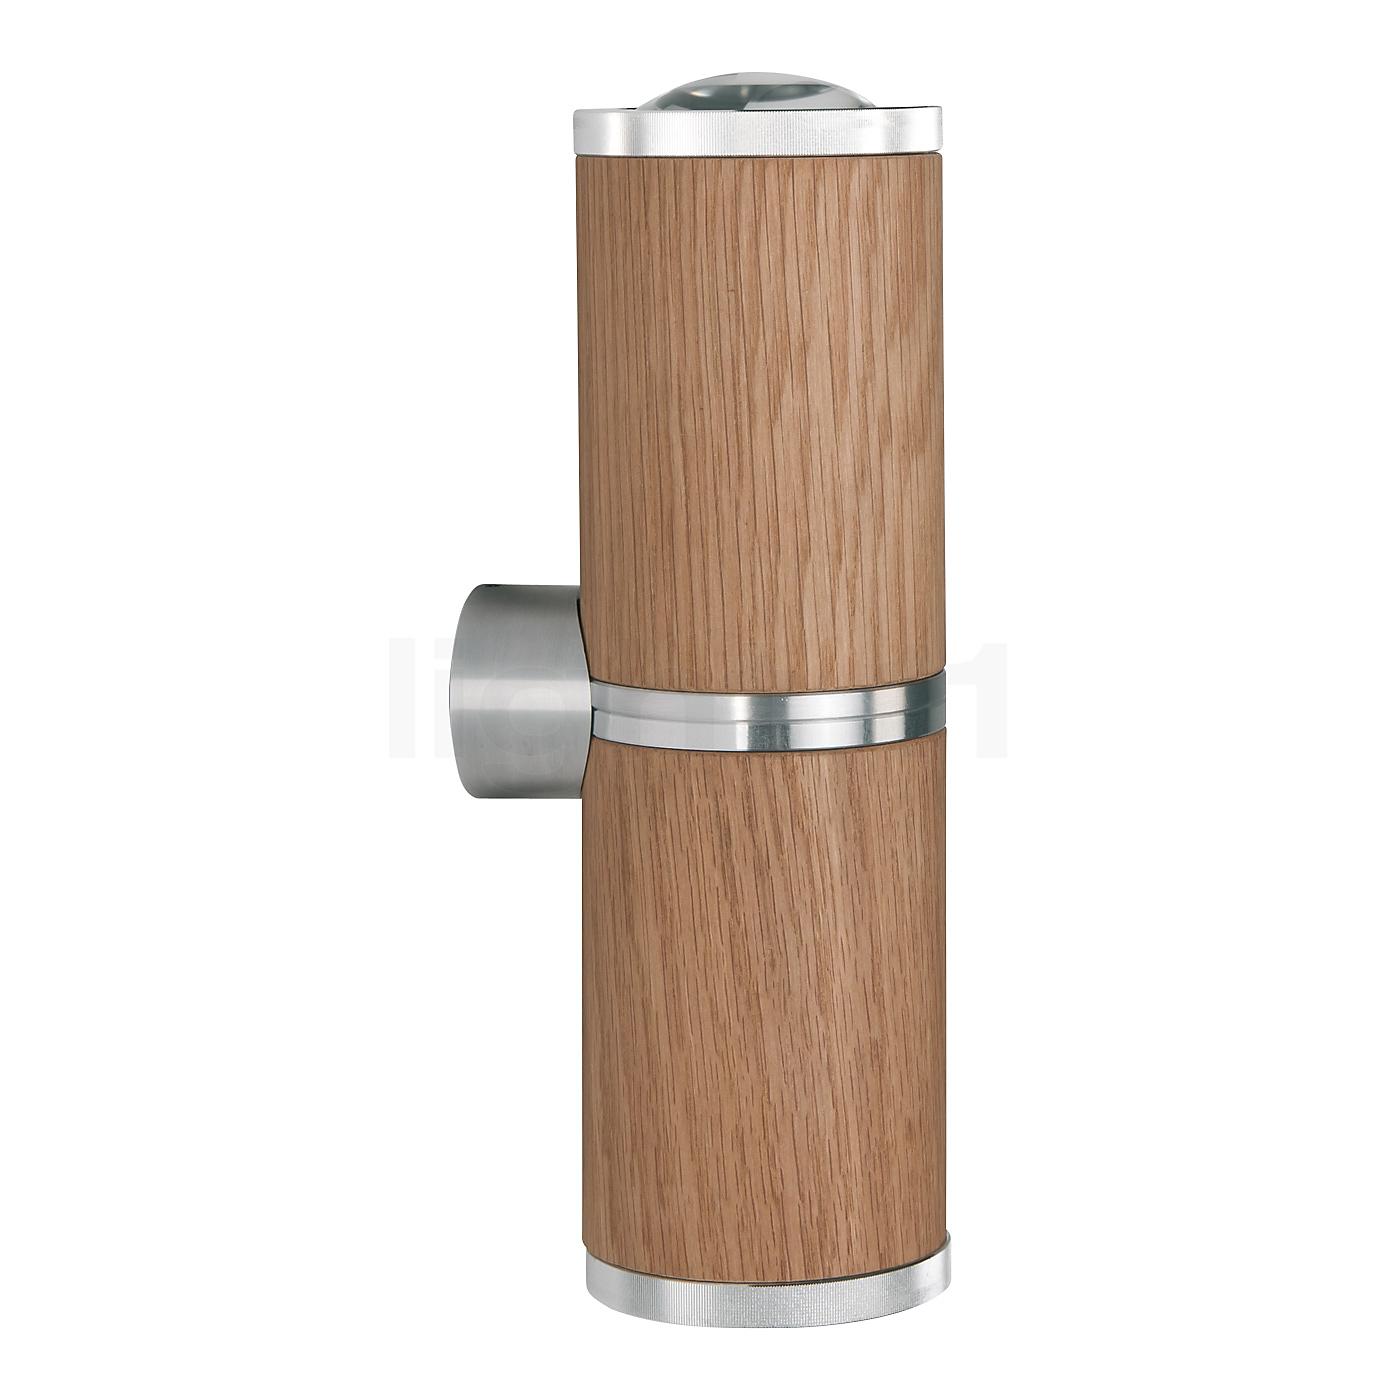 athene 52 wandstrahler up down wandleuchten von less 39 n 39 more kaufen. Black Bedroom Furniture Sets. Home Design Ideas